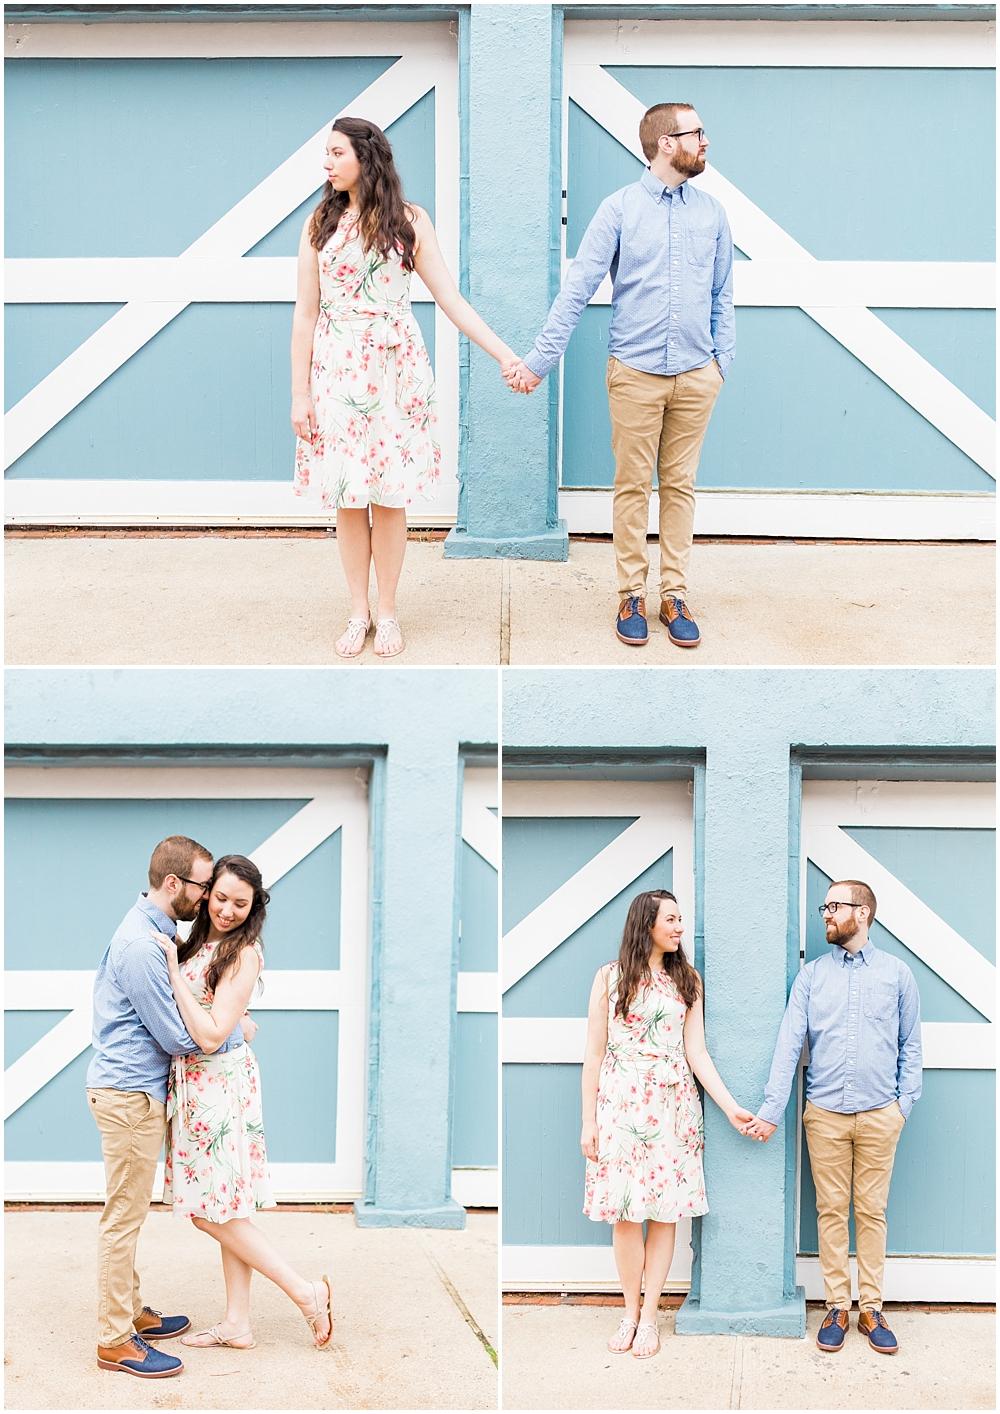 Downtown-Annapolis-Engagement-Photographer-Spring-1783-UP!-Disney-09-11_0005.jpg